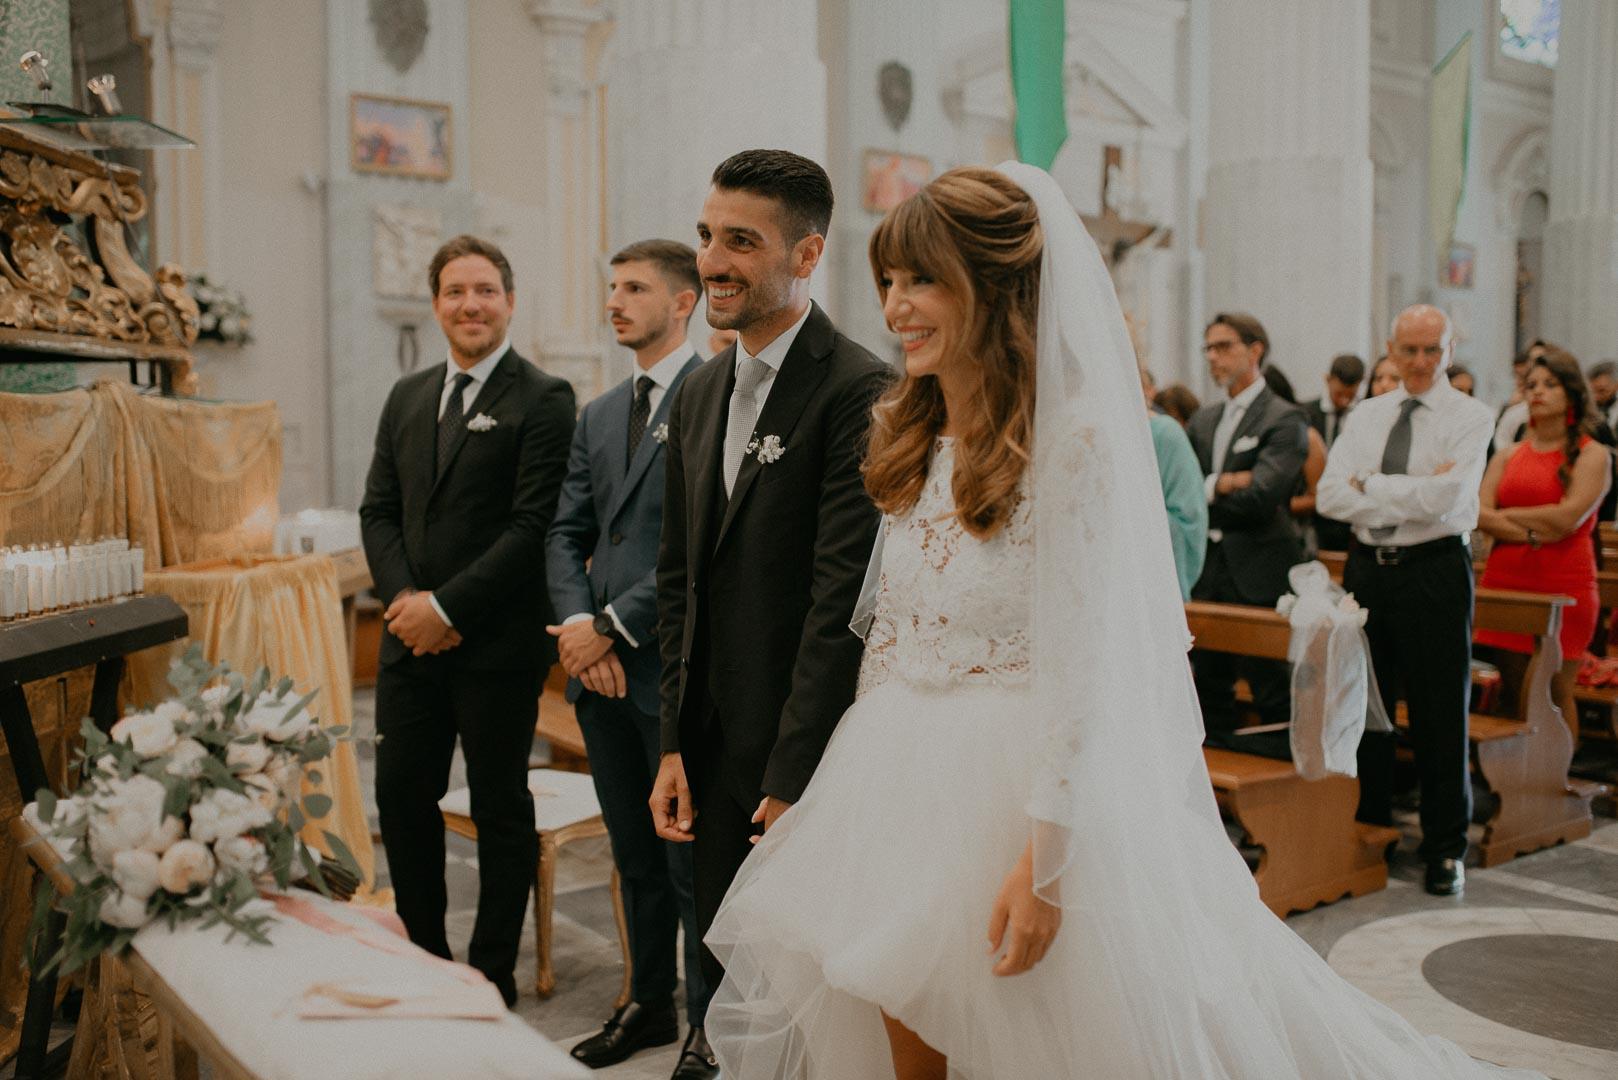 wedding-photographer-destination-fineart-bespoke-reportage-napoli-nabilah-vivianeizzo-spazio46-63